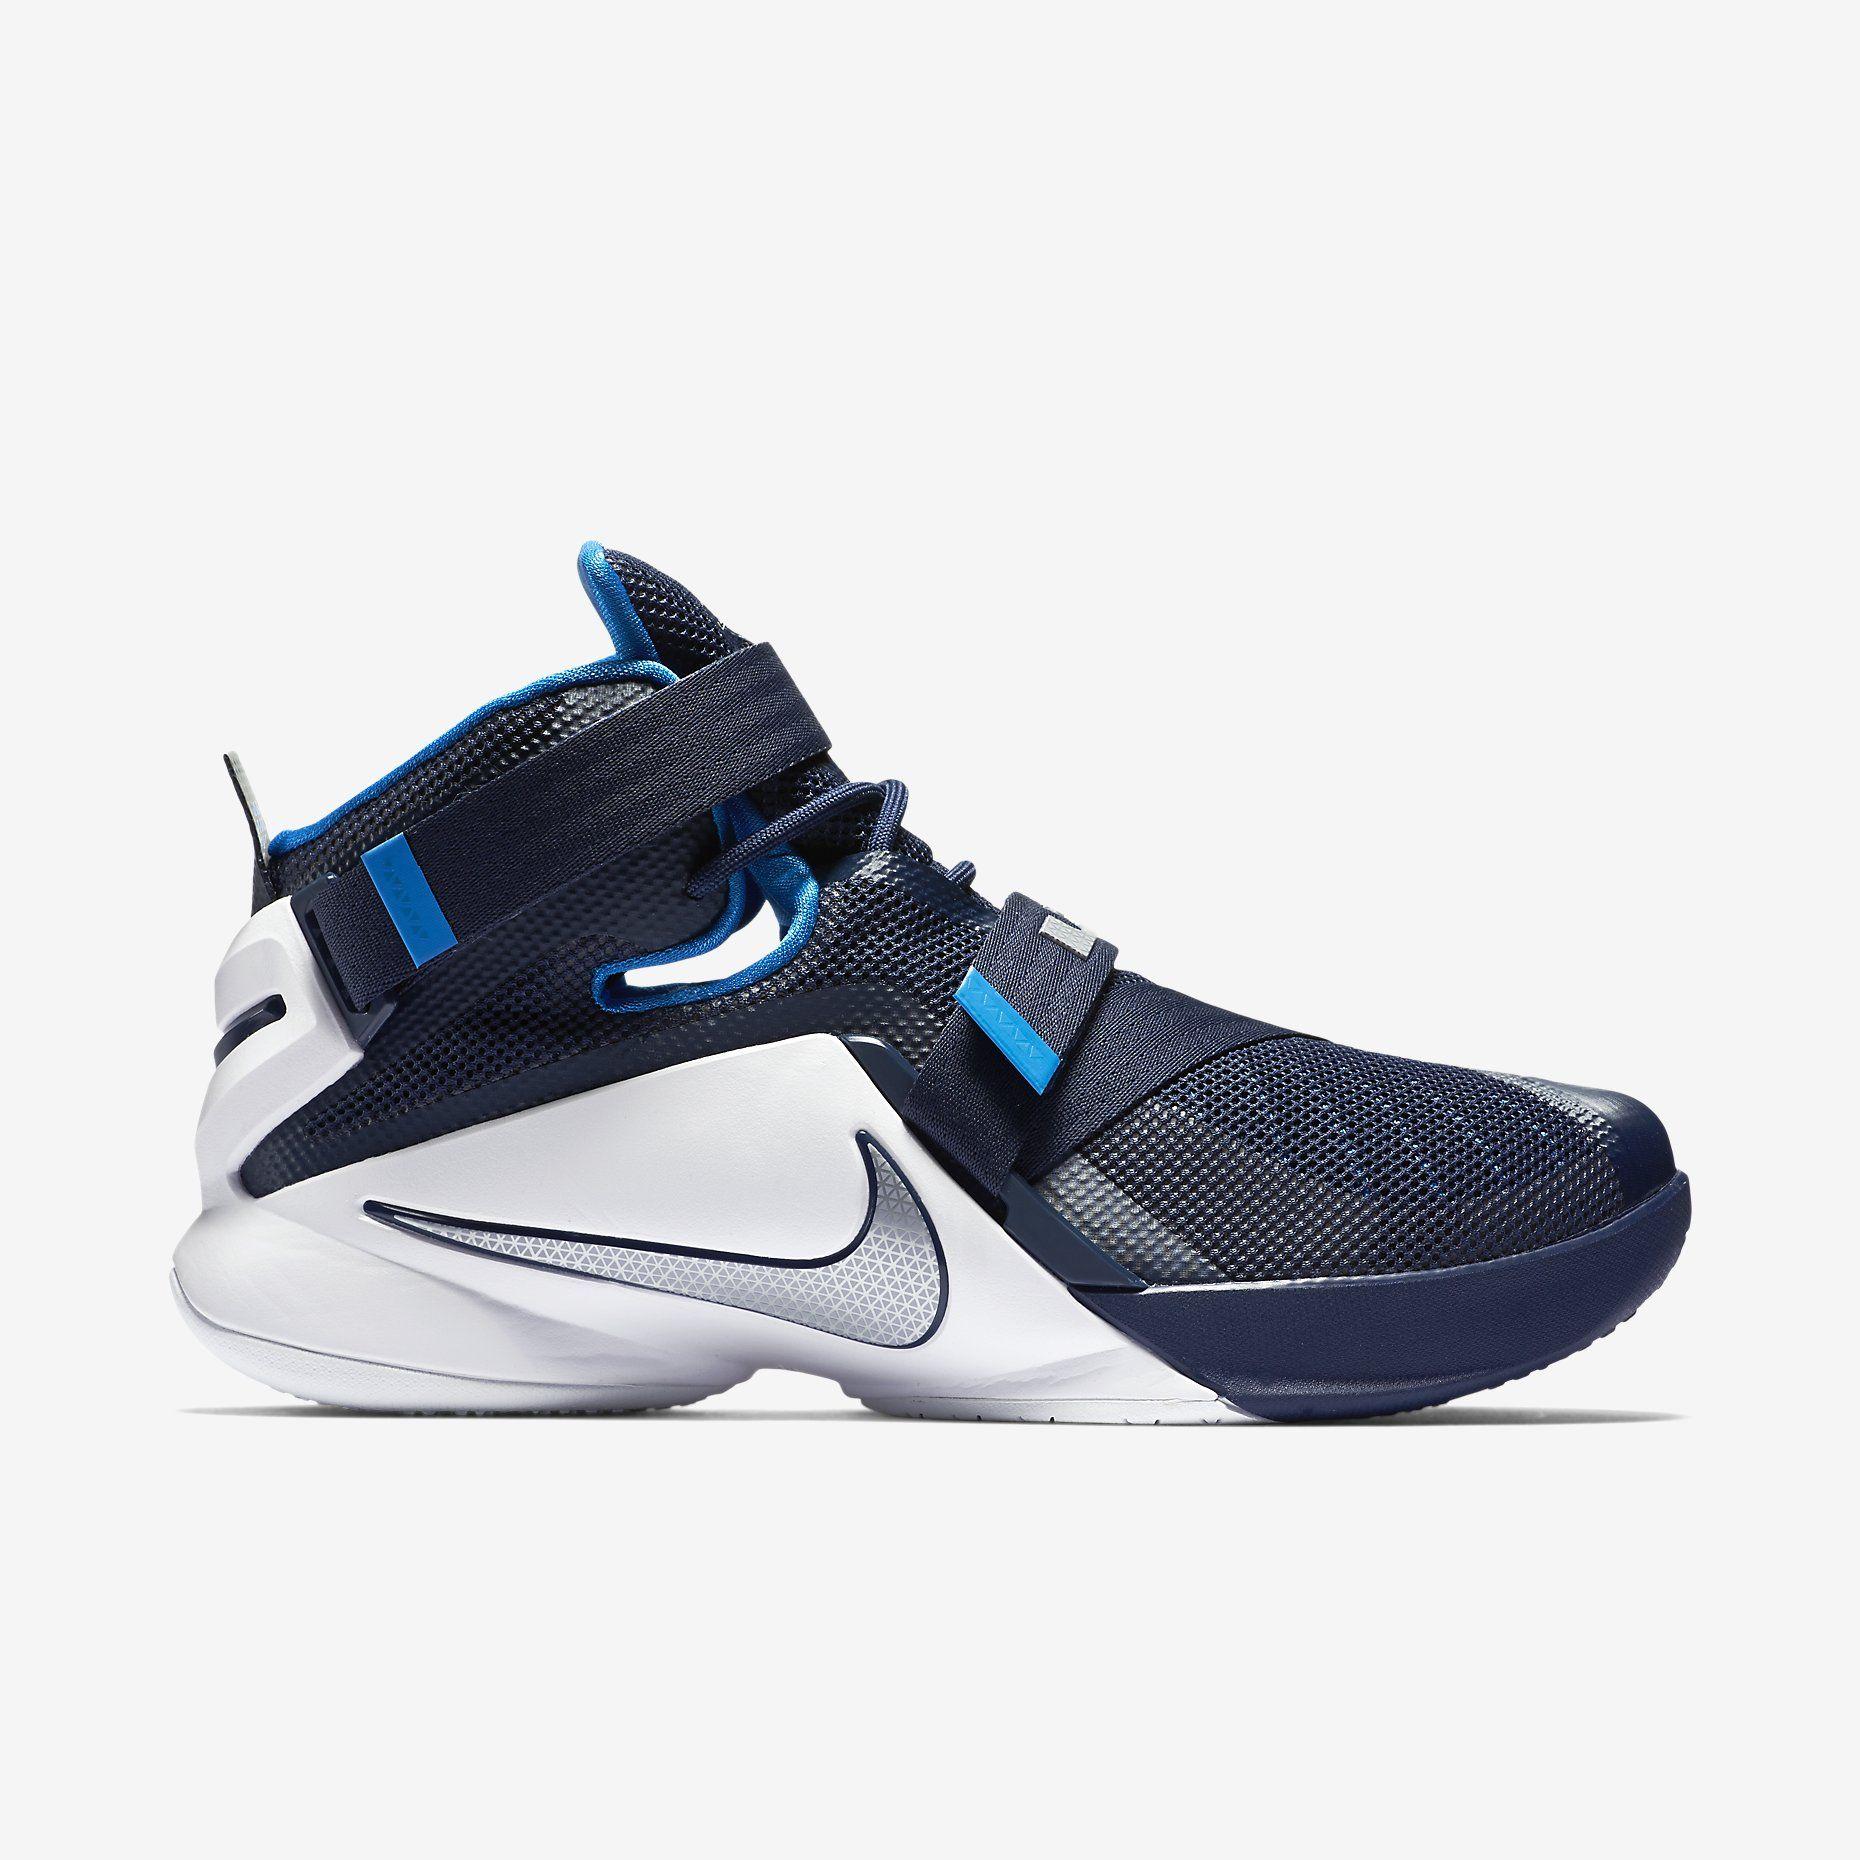 outlet store 6327a 48cab LeBron Soldier 9 (Team) Men s Basketball Shoe. Nike.com